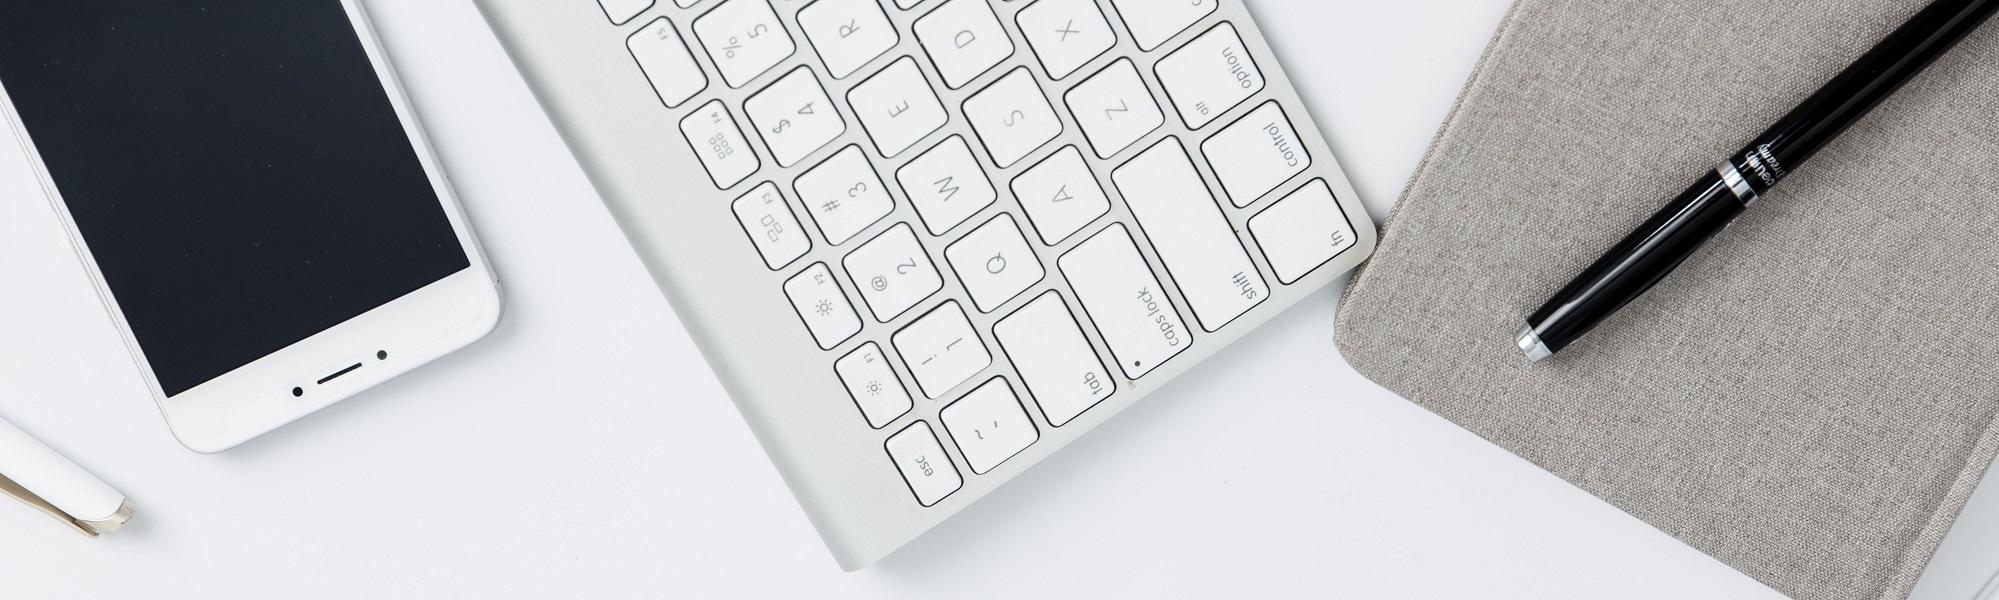 Een smartphone, toetsenbord en blocknote